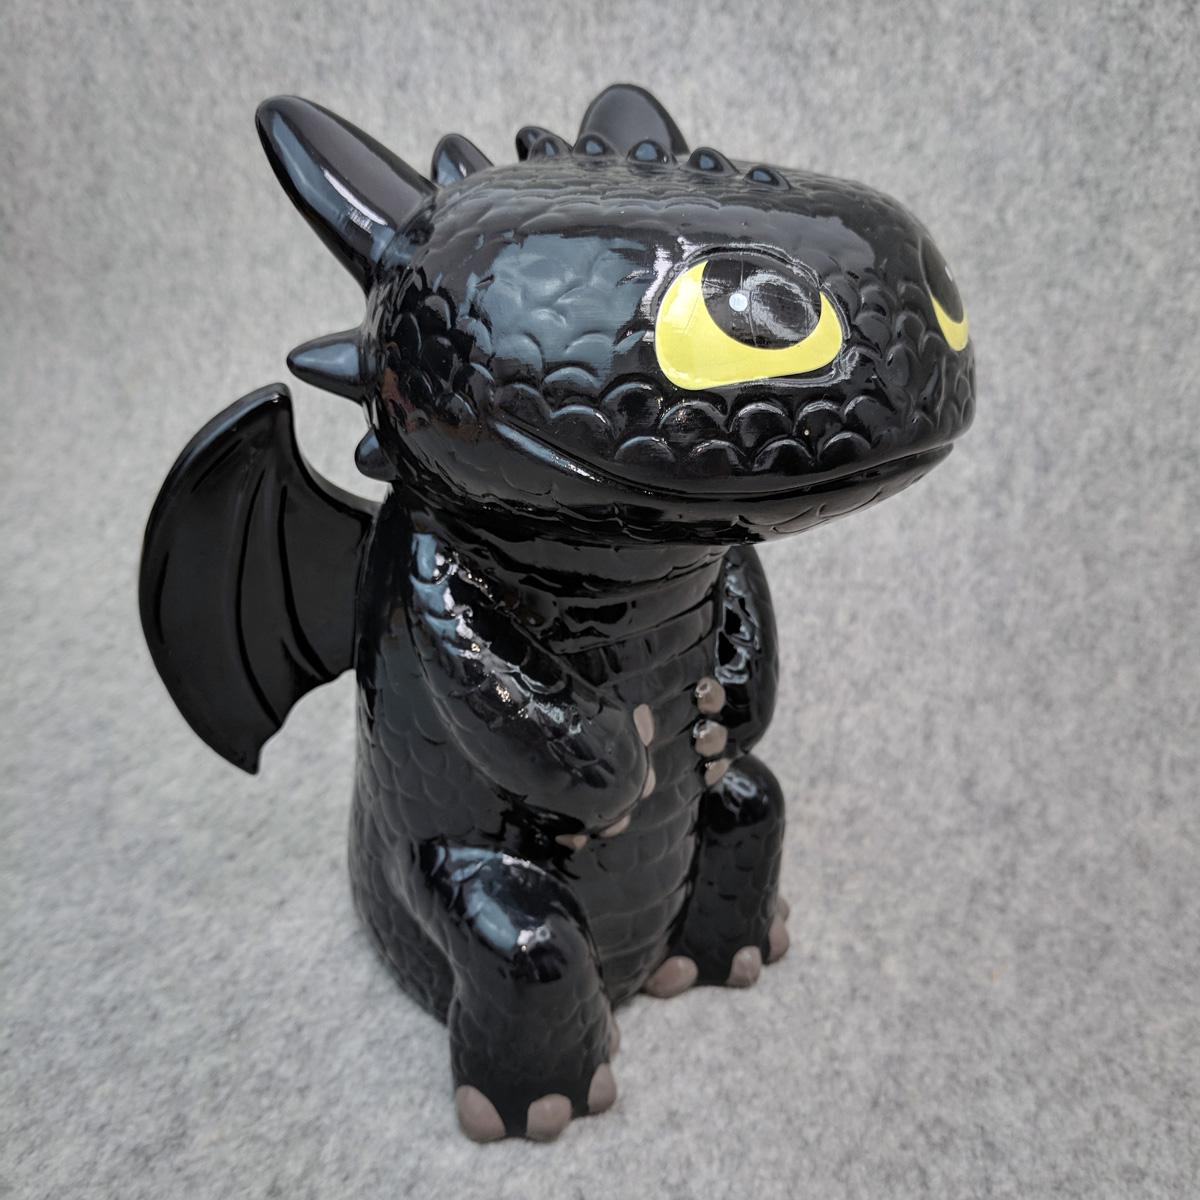 oniracom_dragon_comotion.jpg